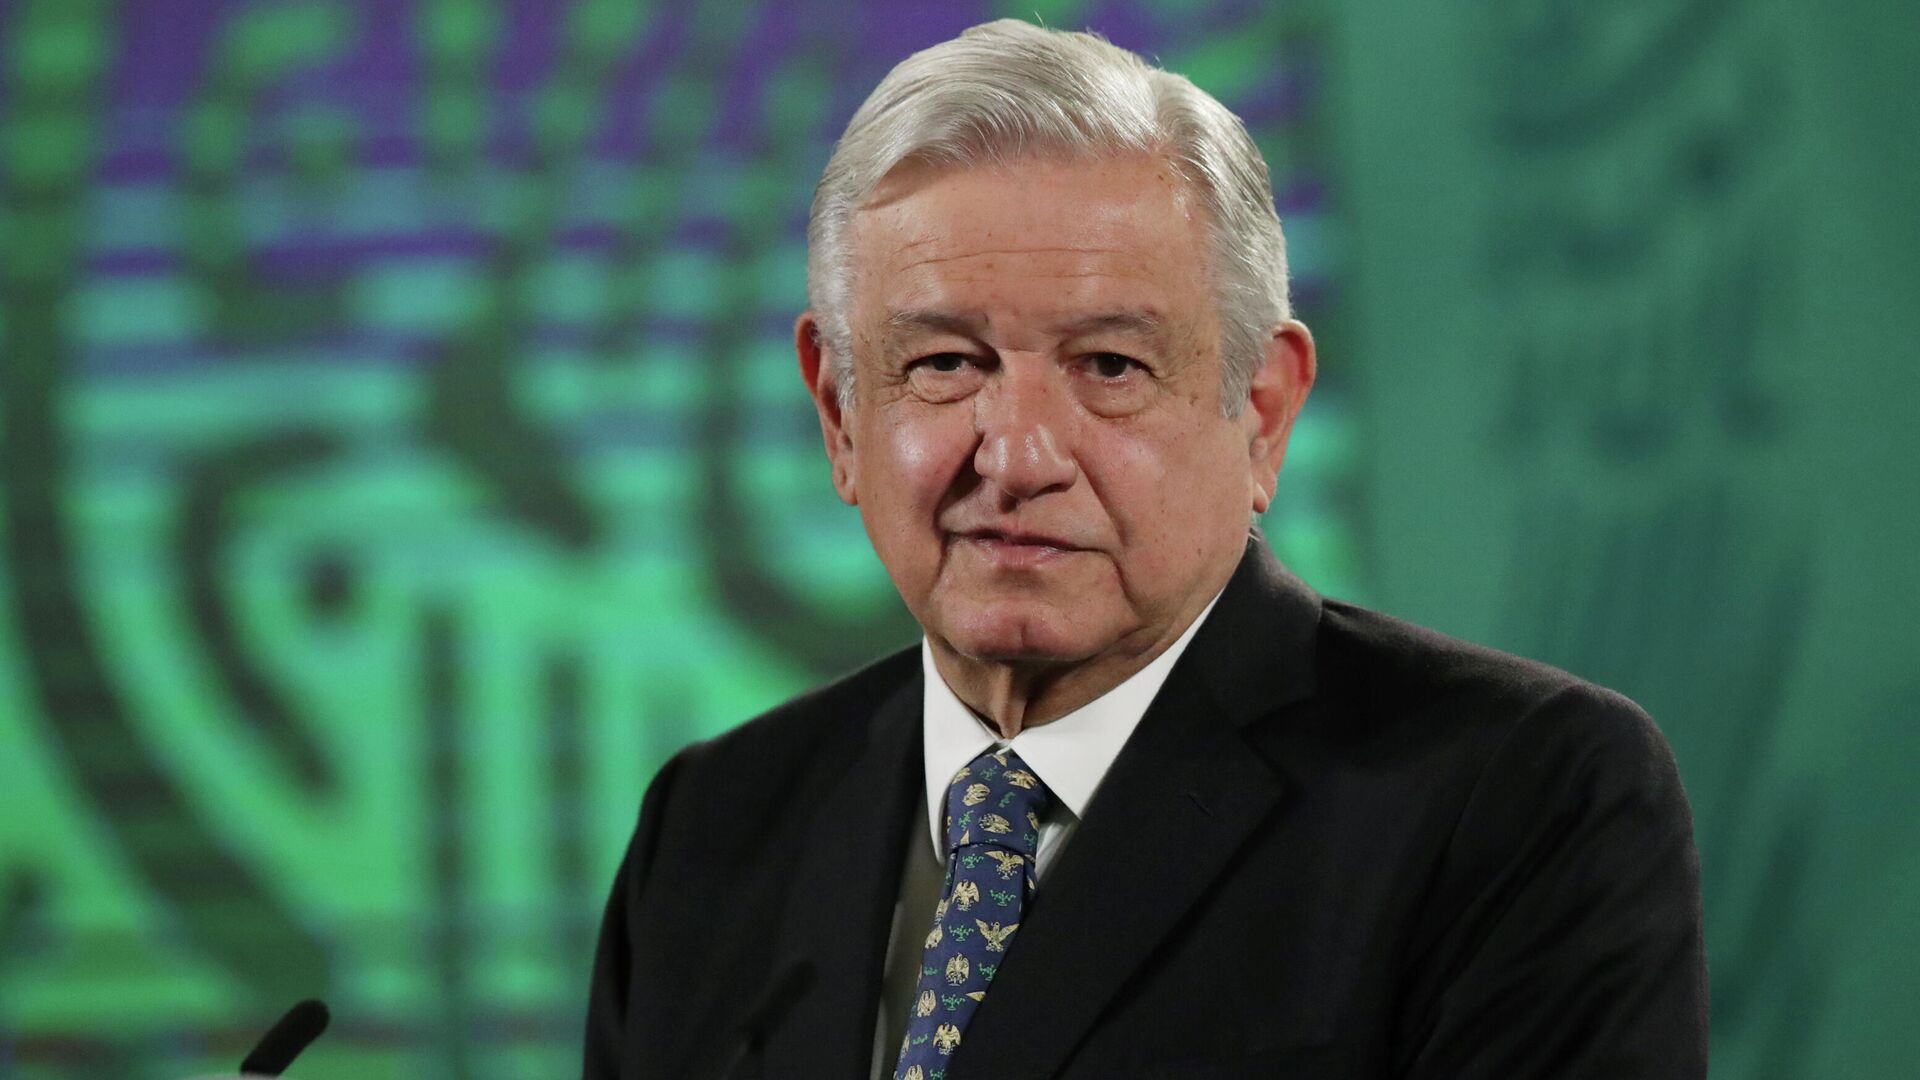 Andrés Manuel López Obrador, el presidente de México  - Sputnik Mundo, 1920, 05.05.2021